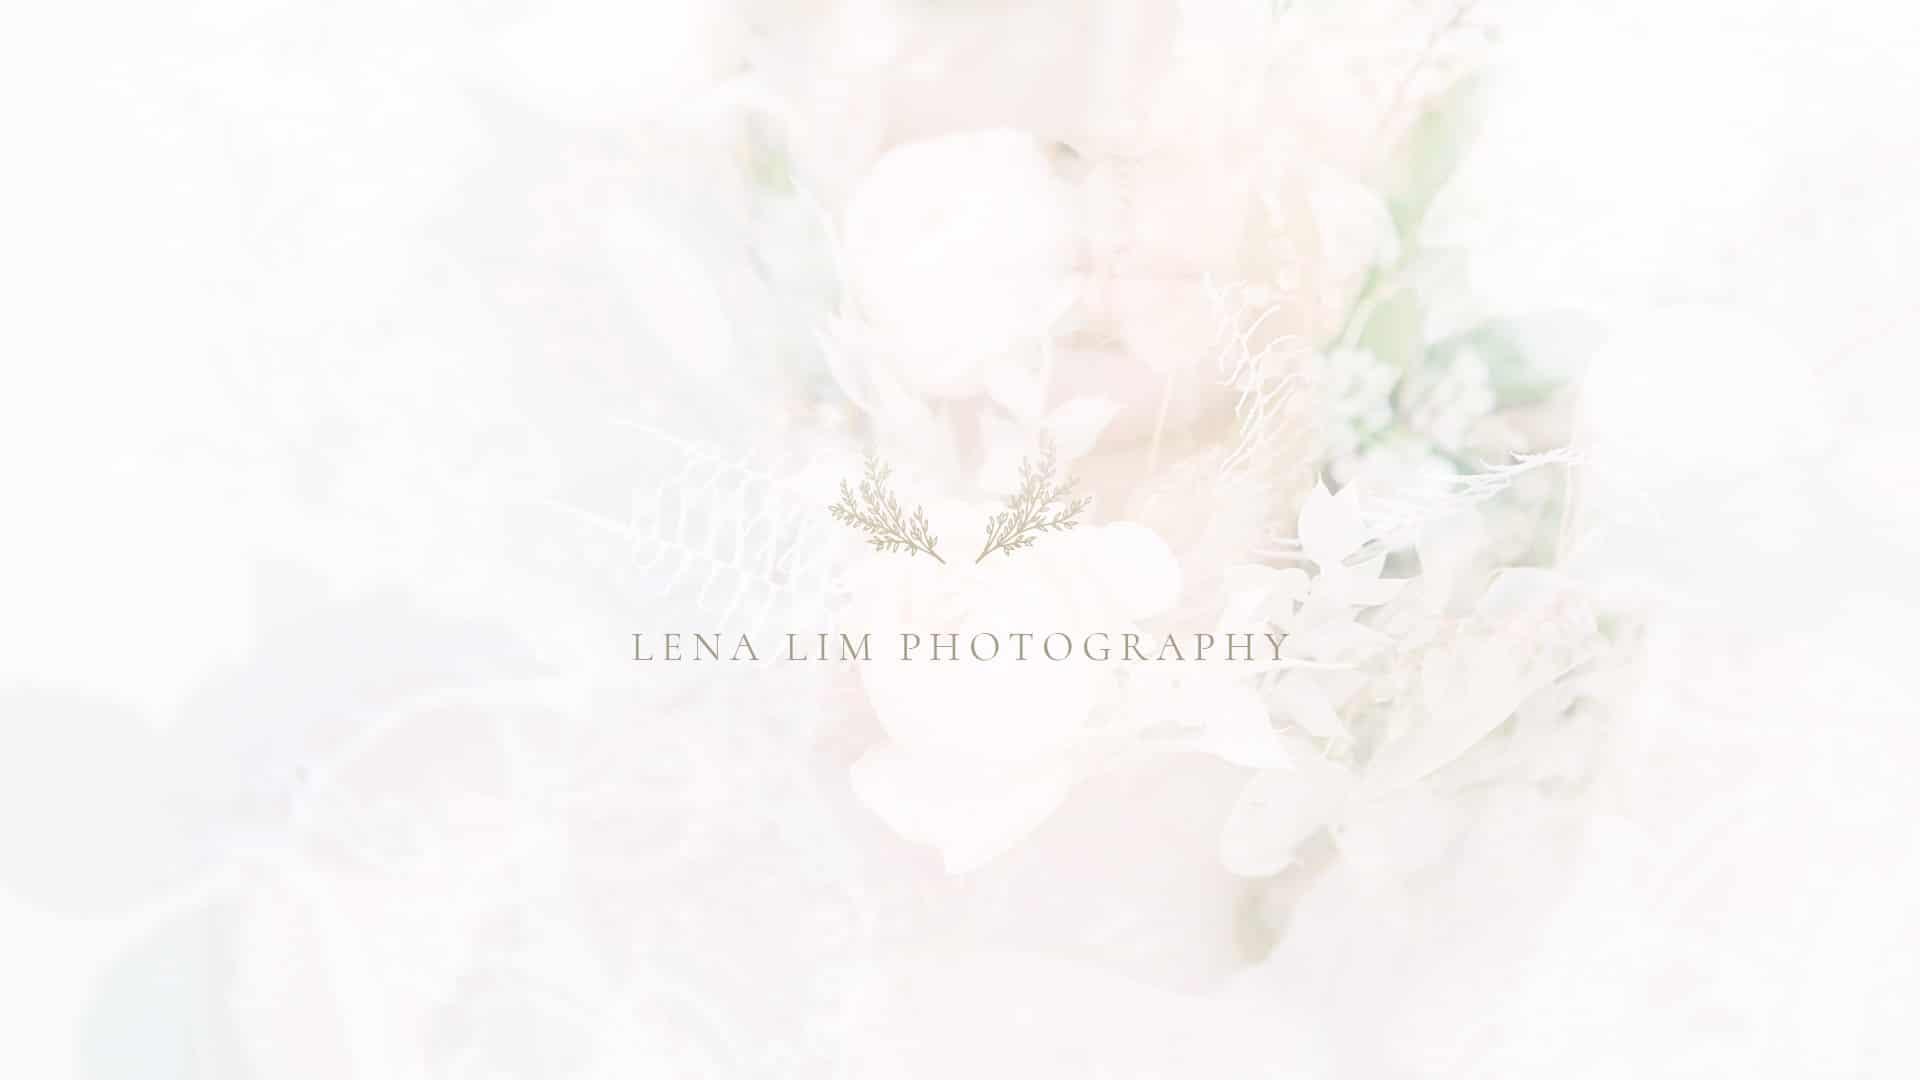 Lena Lim Photography video